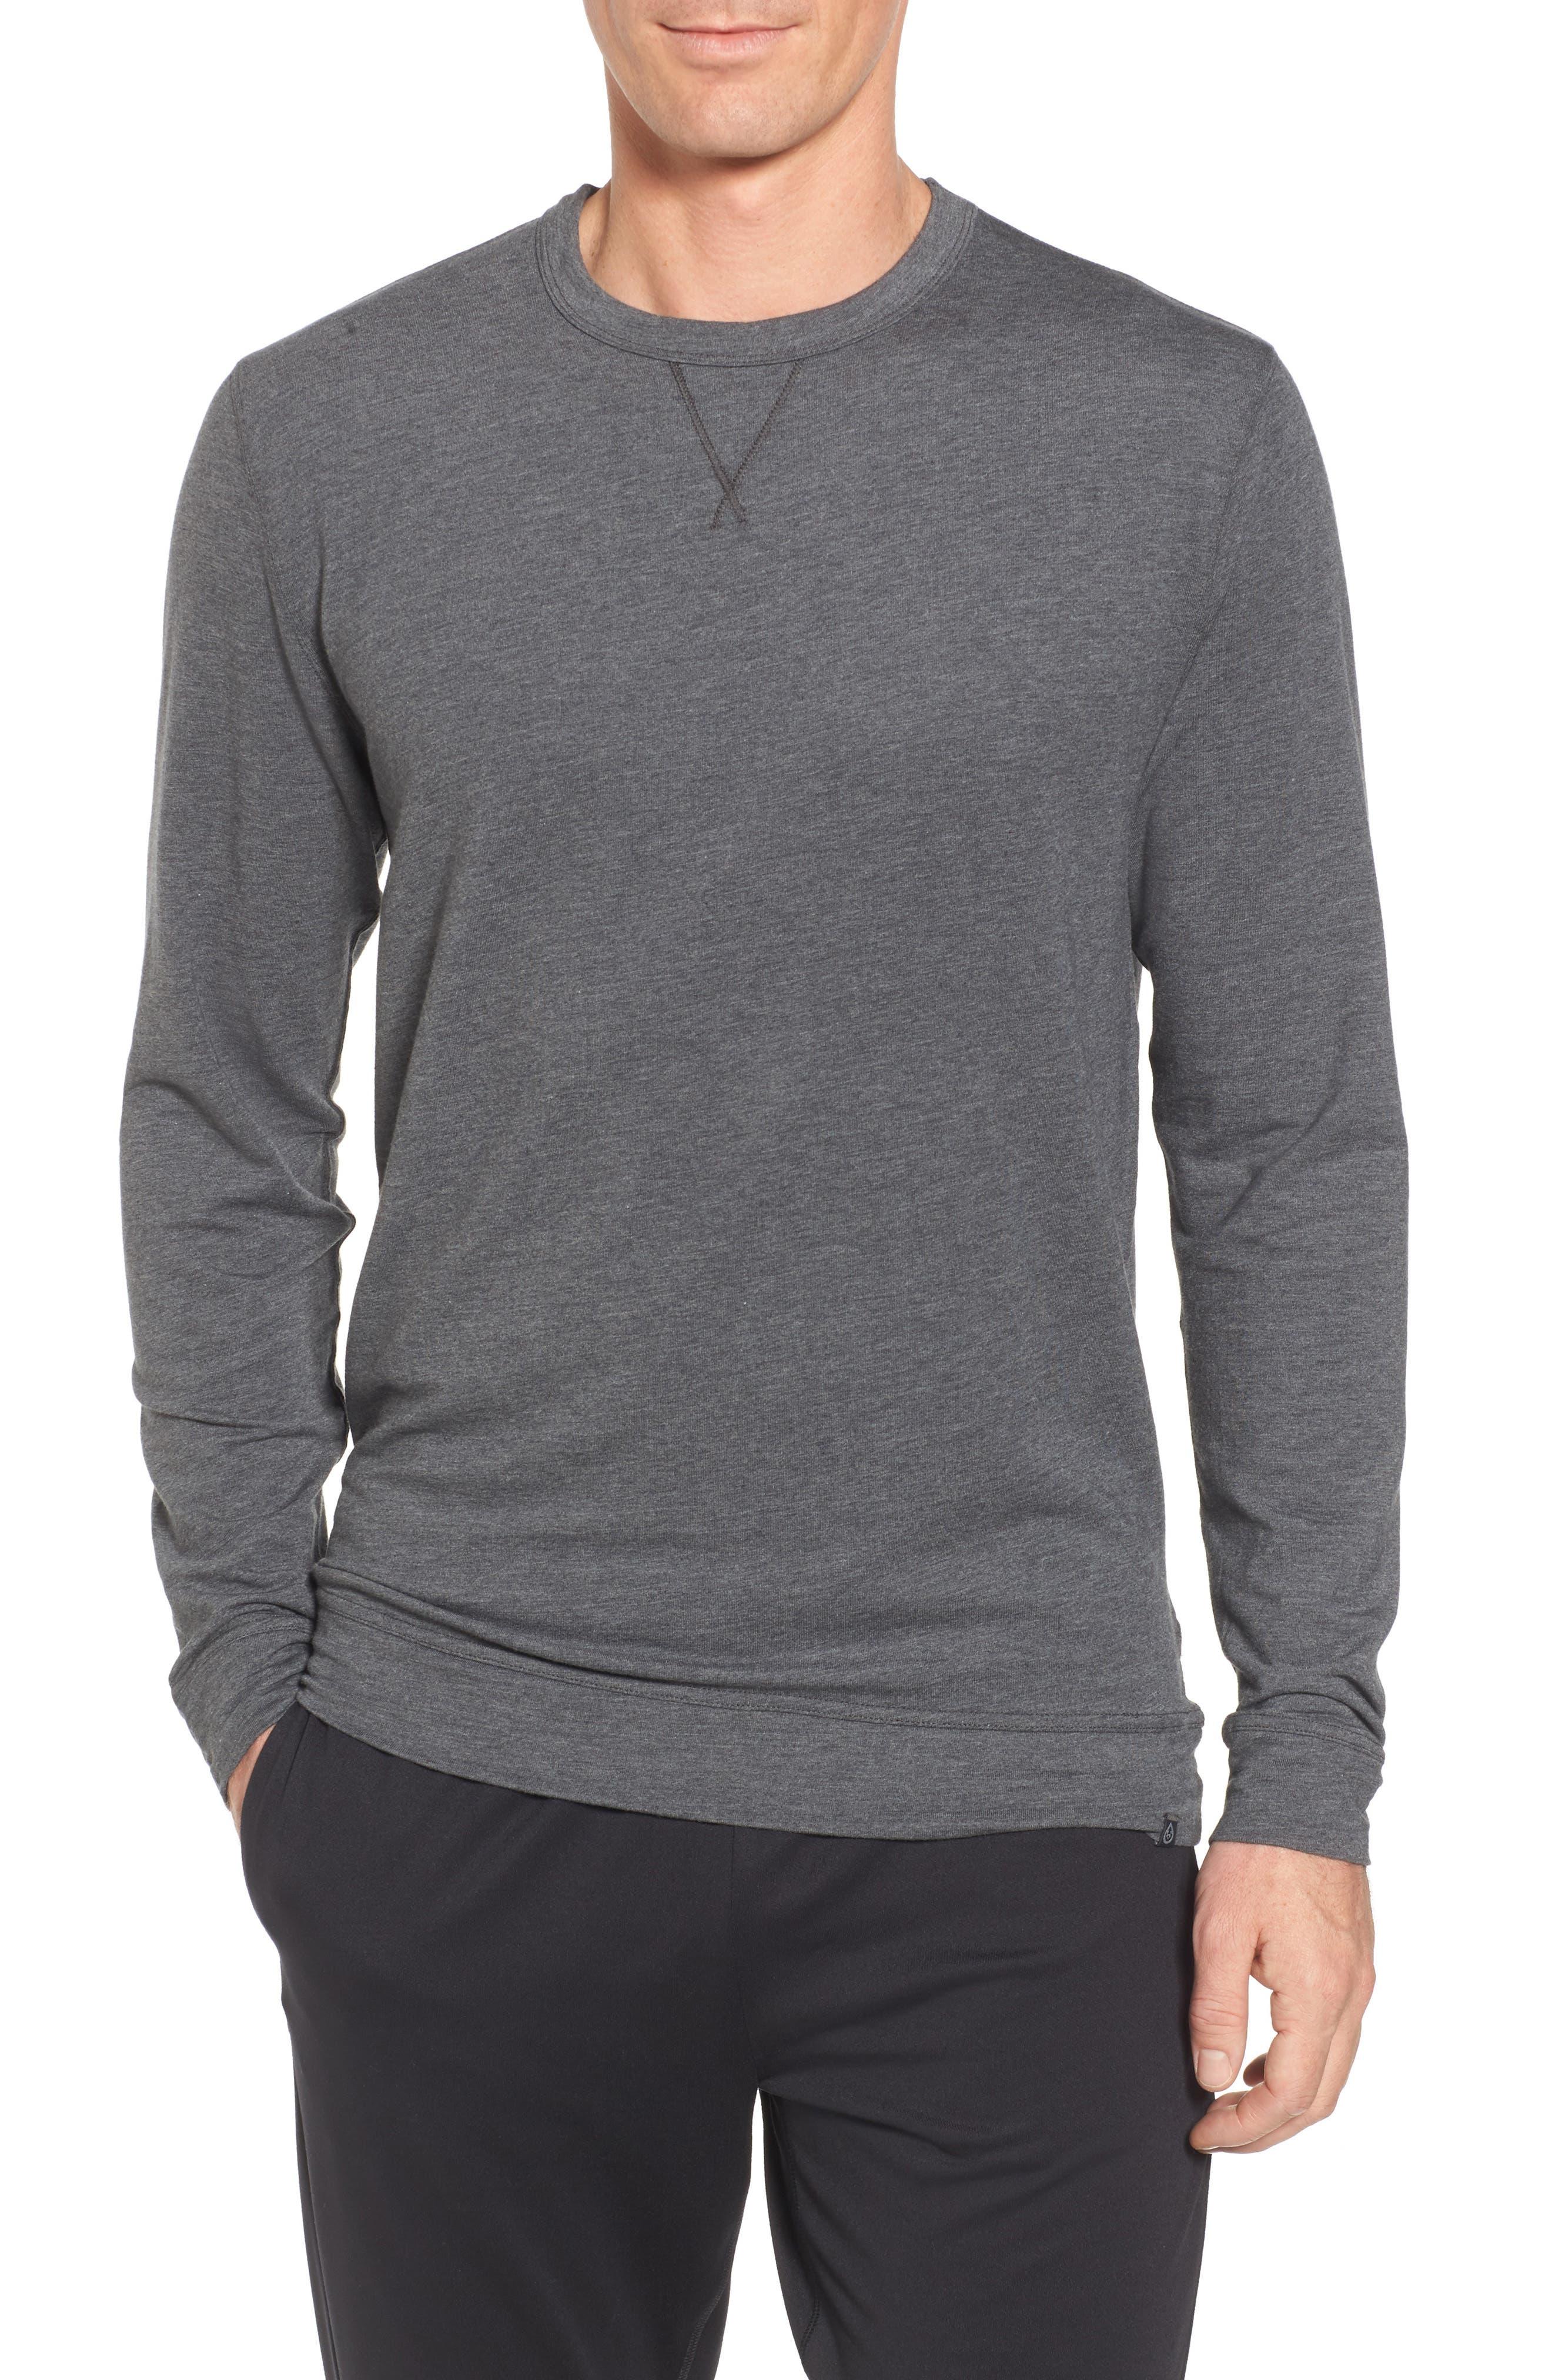 TASC PERFORMANCE Legacy Crewneck Sweatshirt, Main, color, BLACK HEATHER